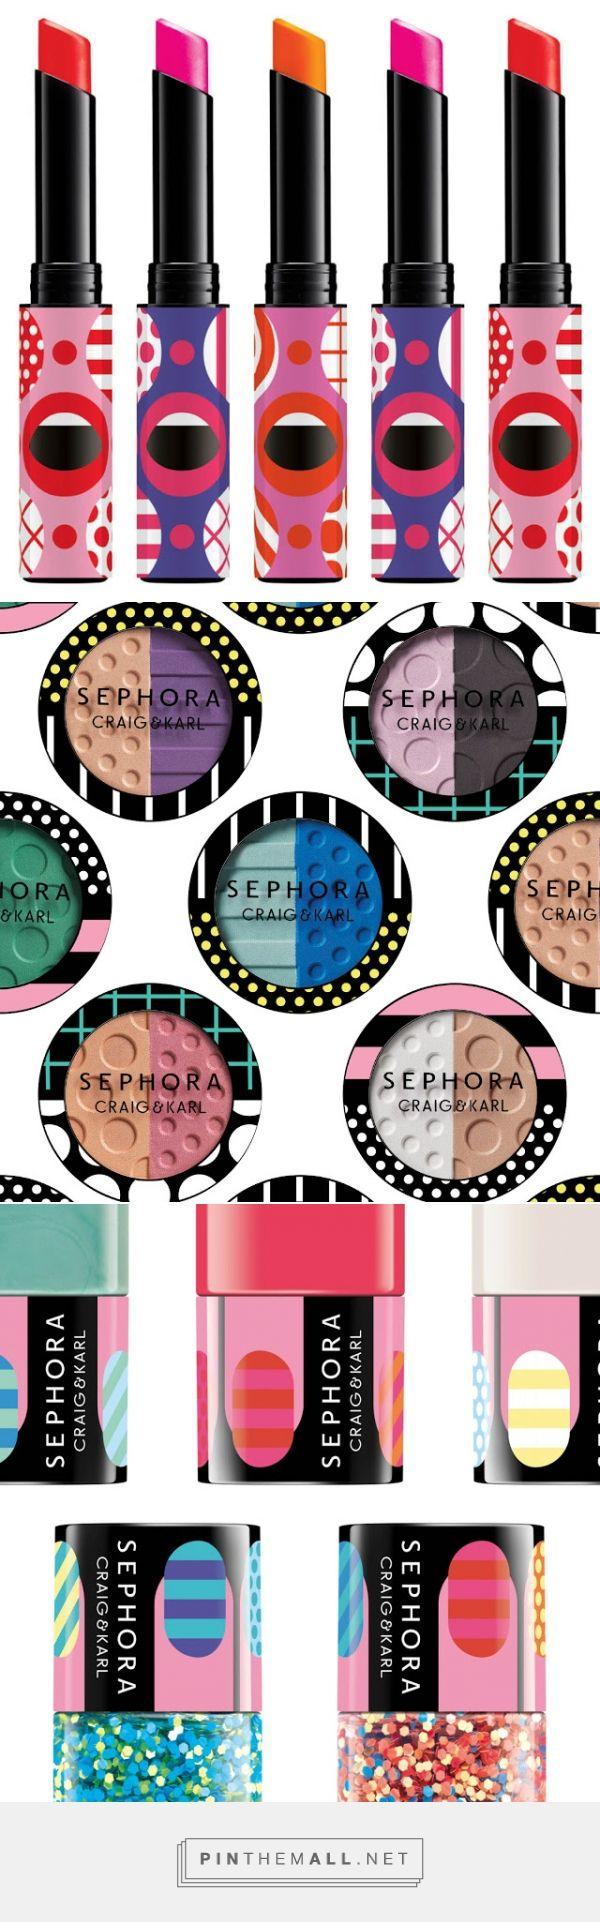 Sephora  cosmetics packaging designed by Craig & Karl…